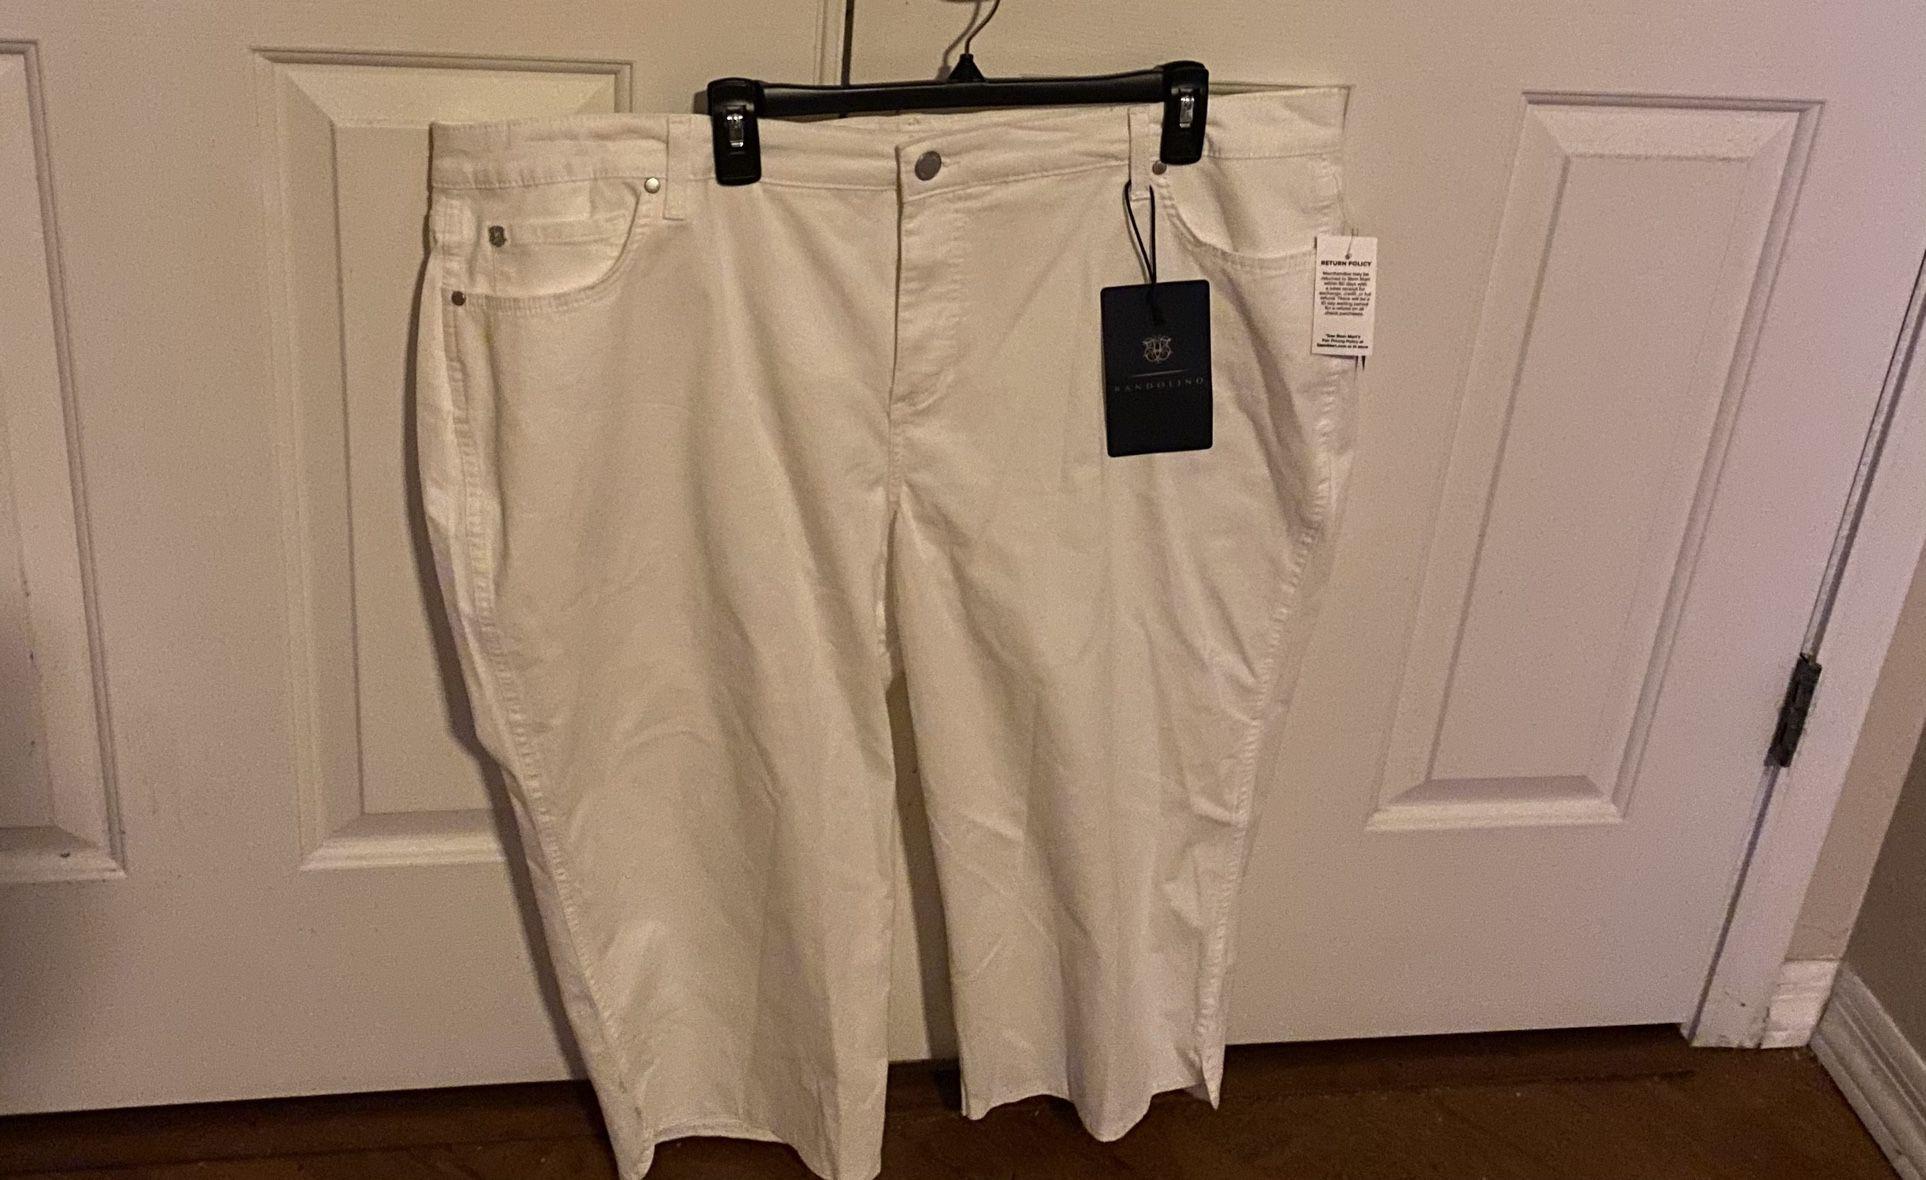 WOMENS BANDOLINO jEANS  WHITE CAPRI PANTS SIZe  22 W